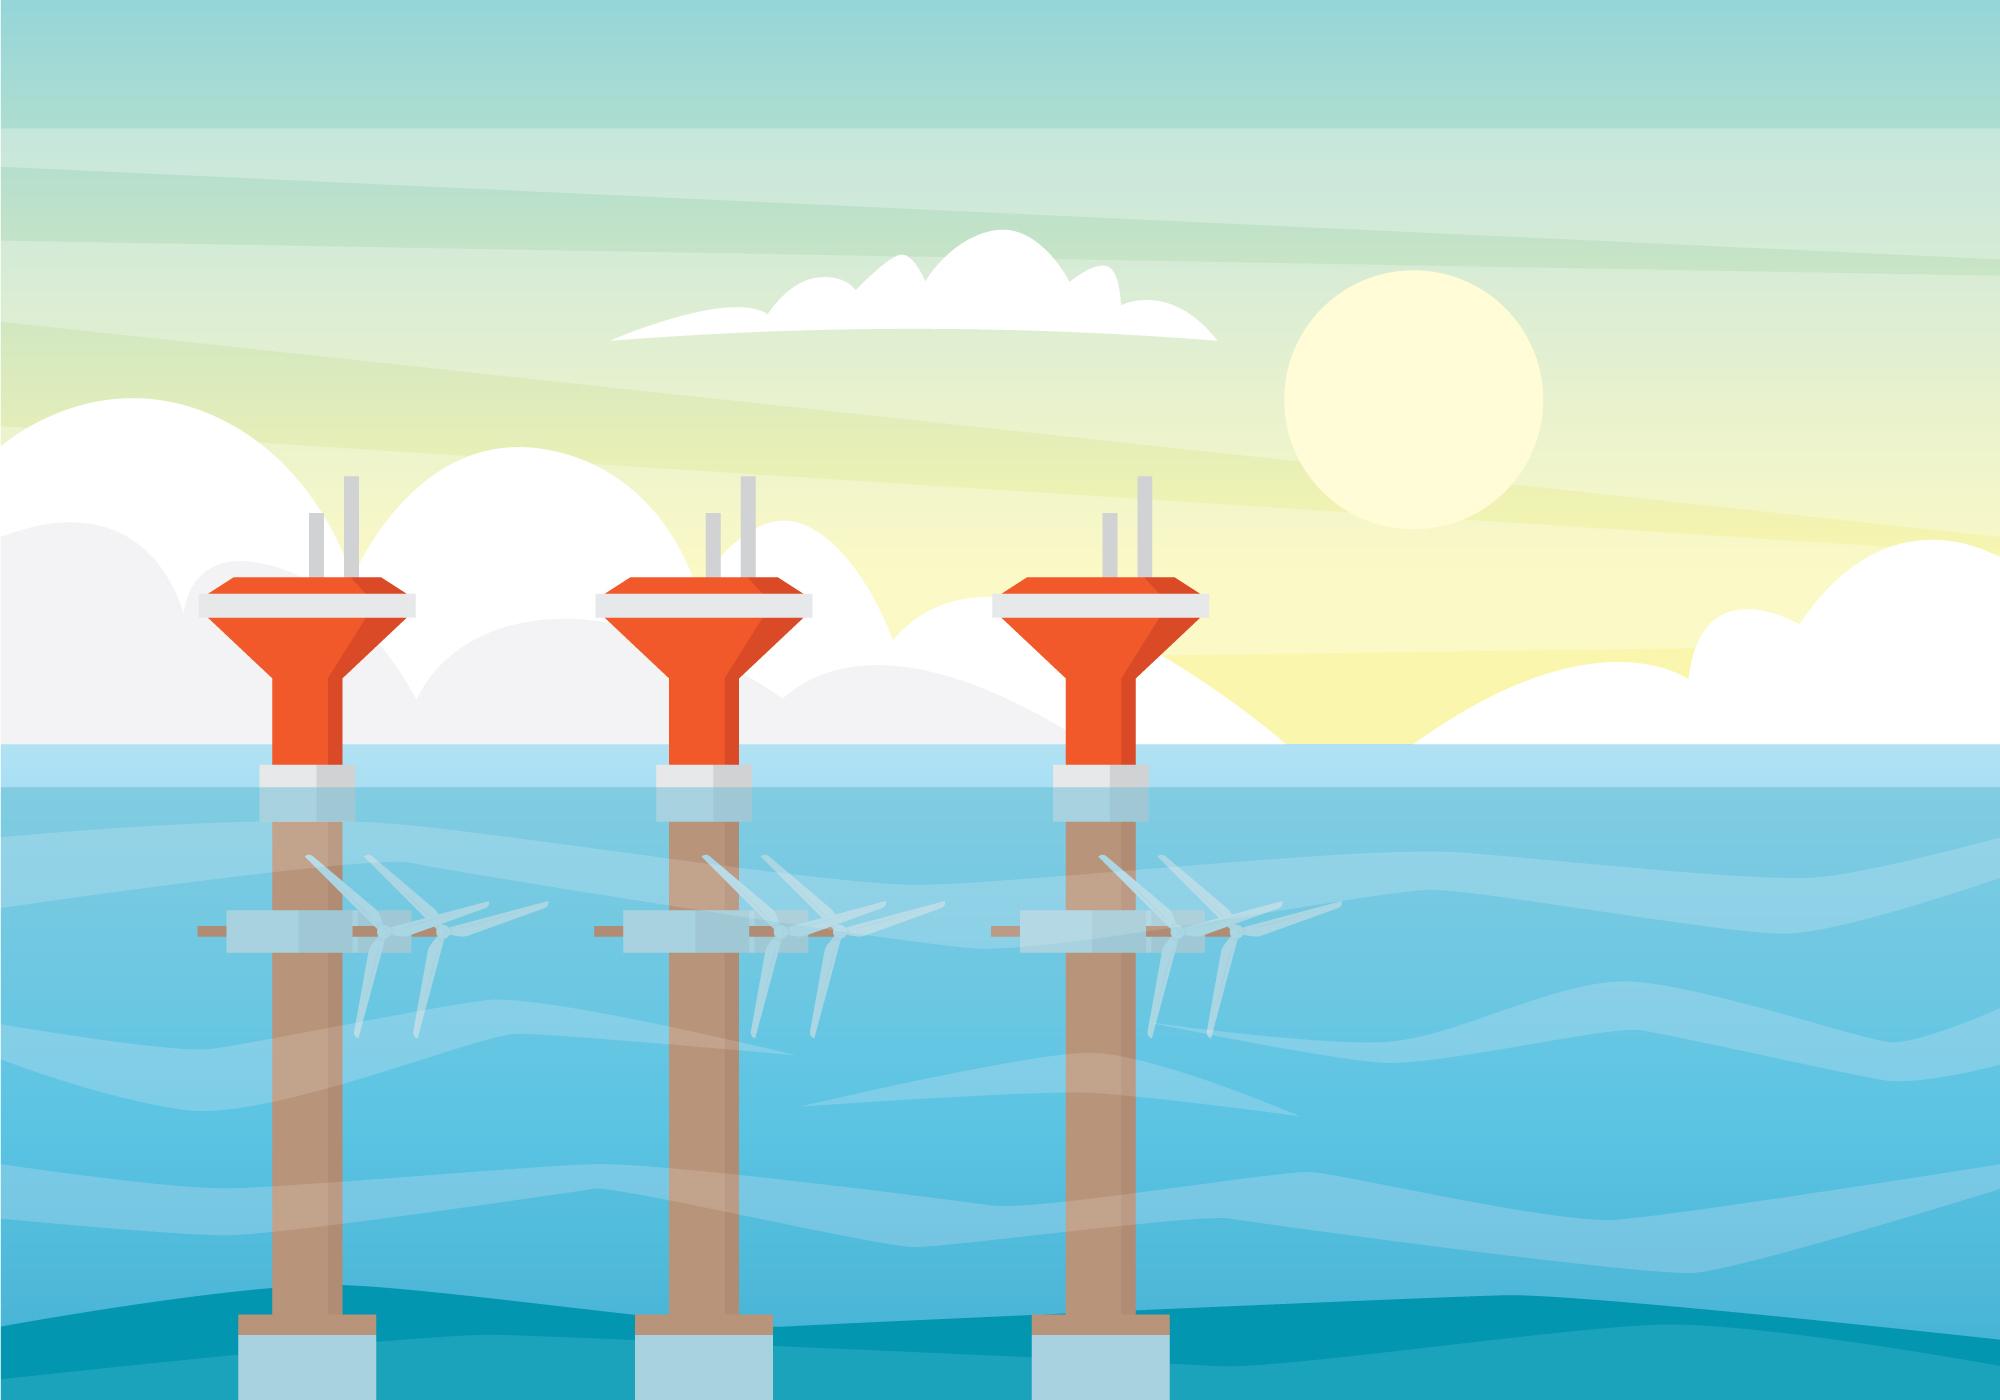 Tidal Energy Illustration Concept Download Free Vector